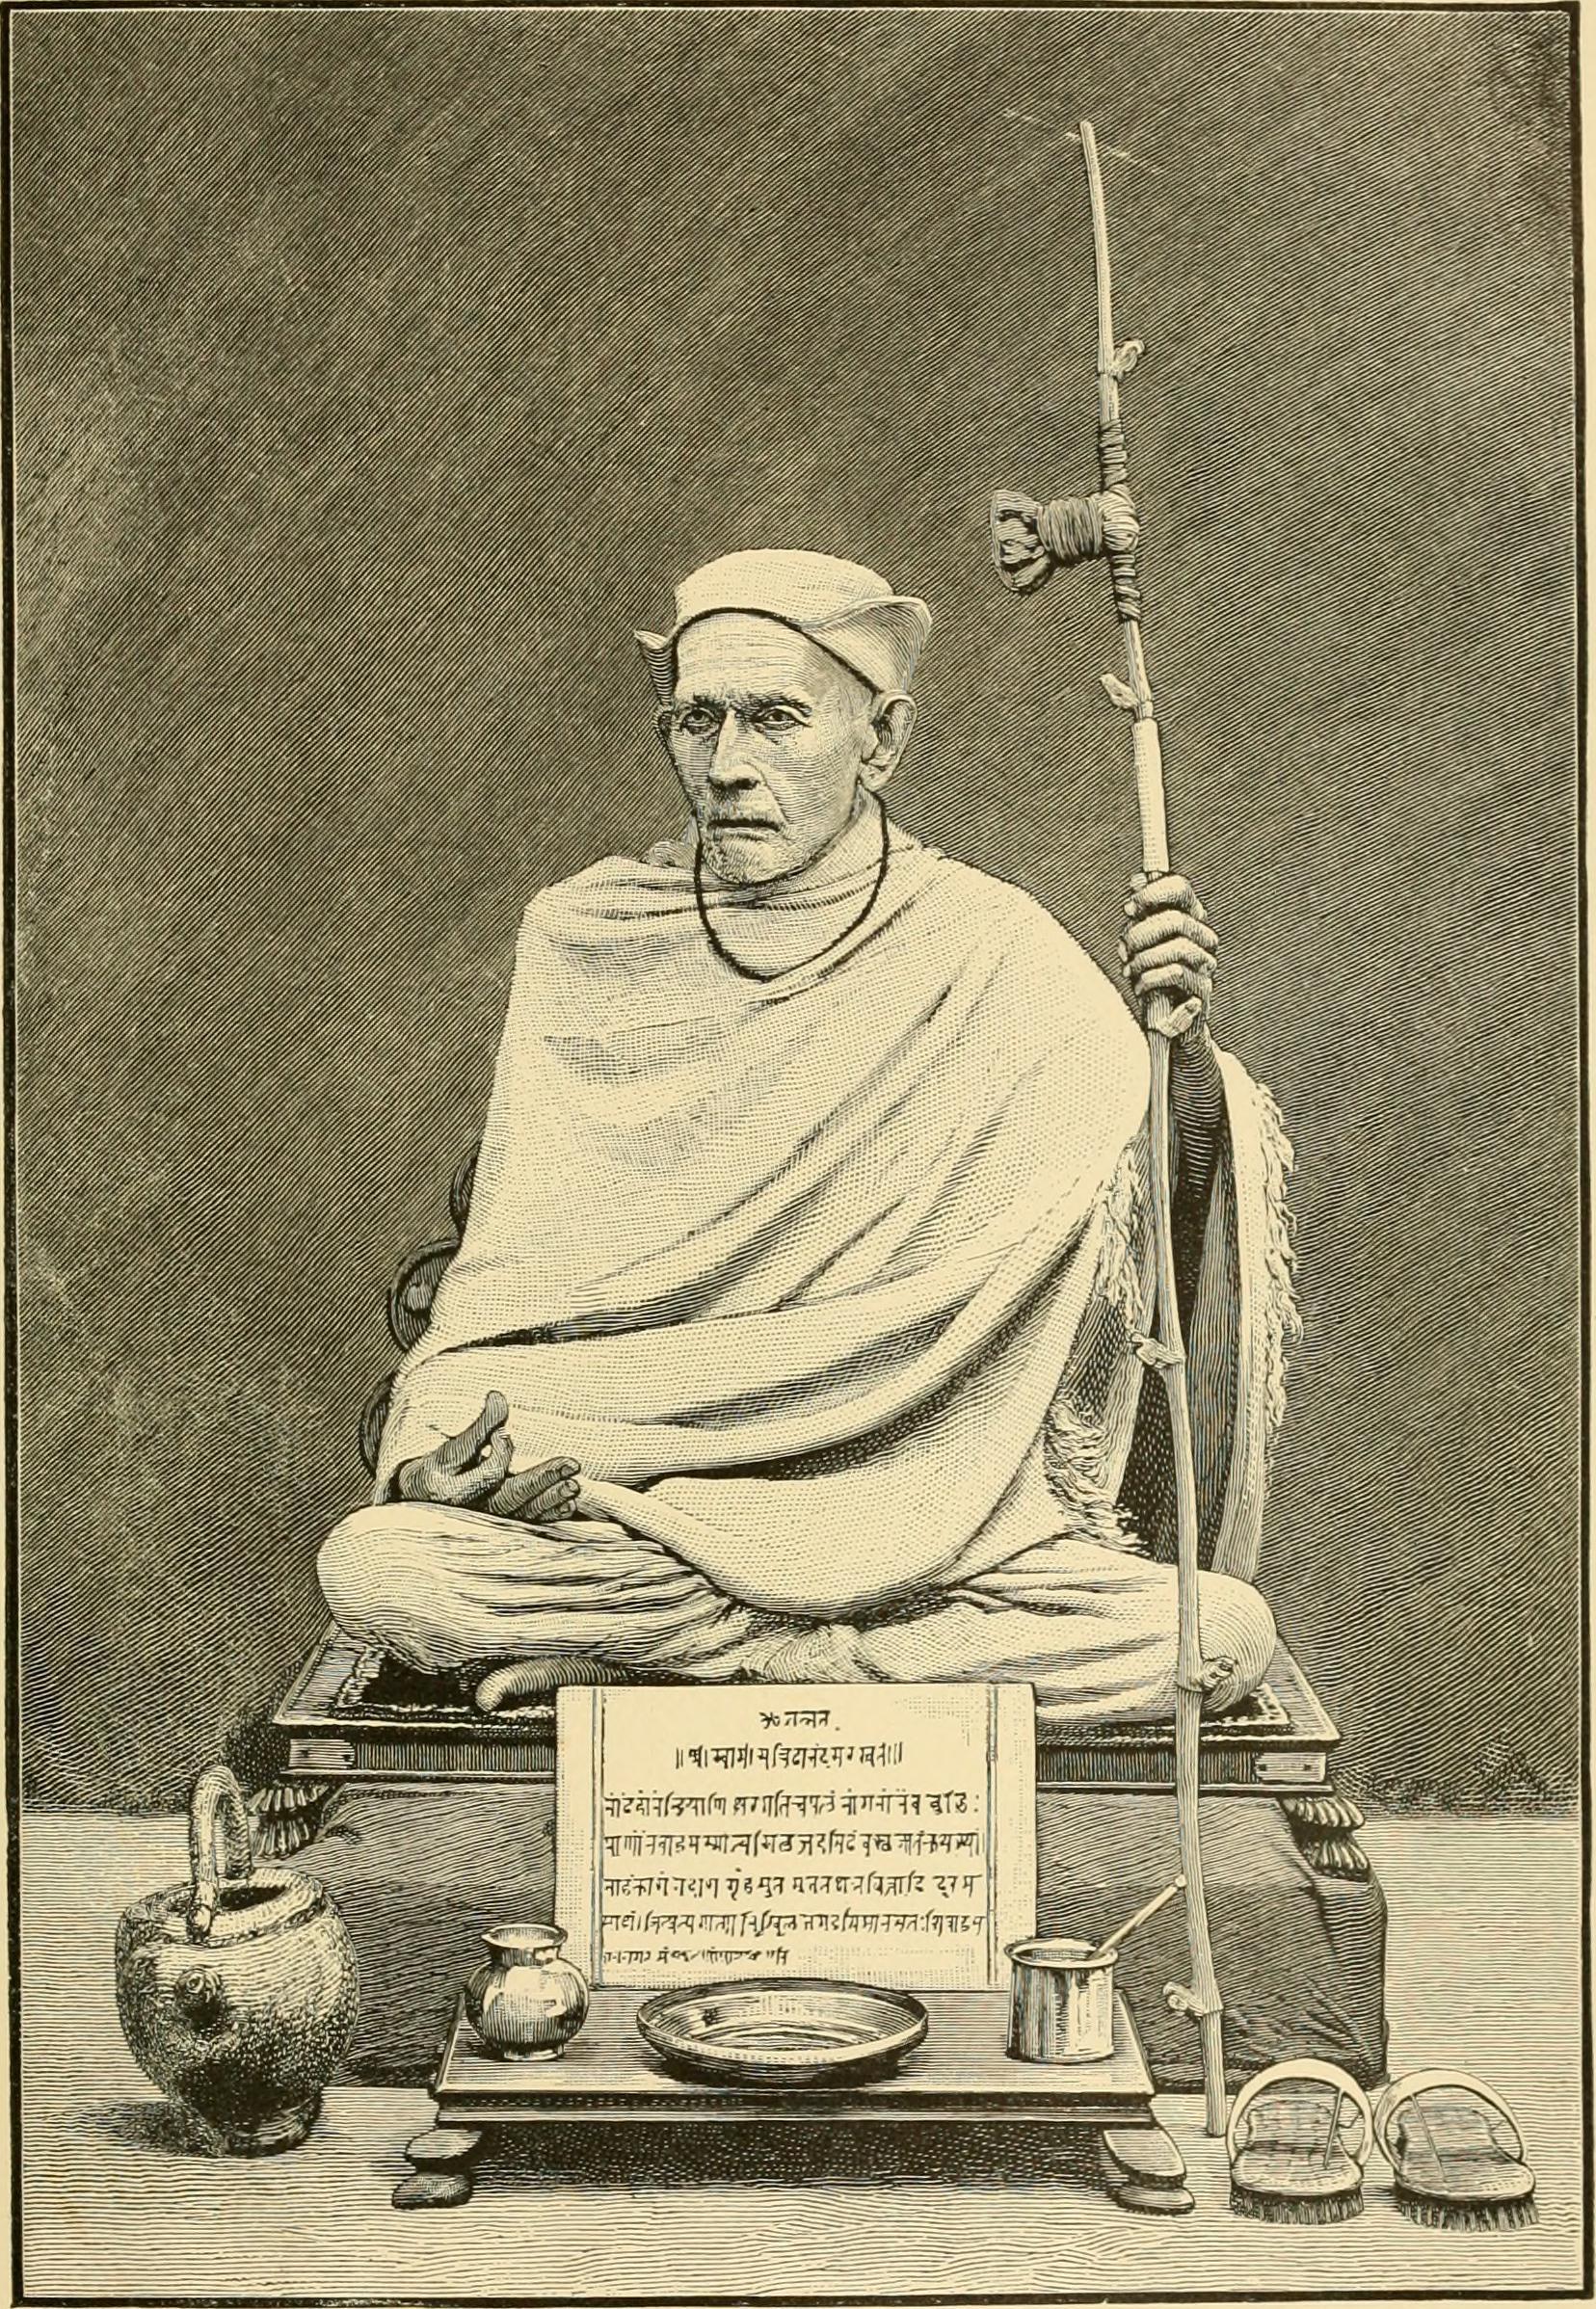 Buddhism, Hinduism, Brahmanism, Jogi, an ascetic man